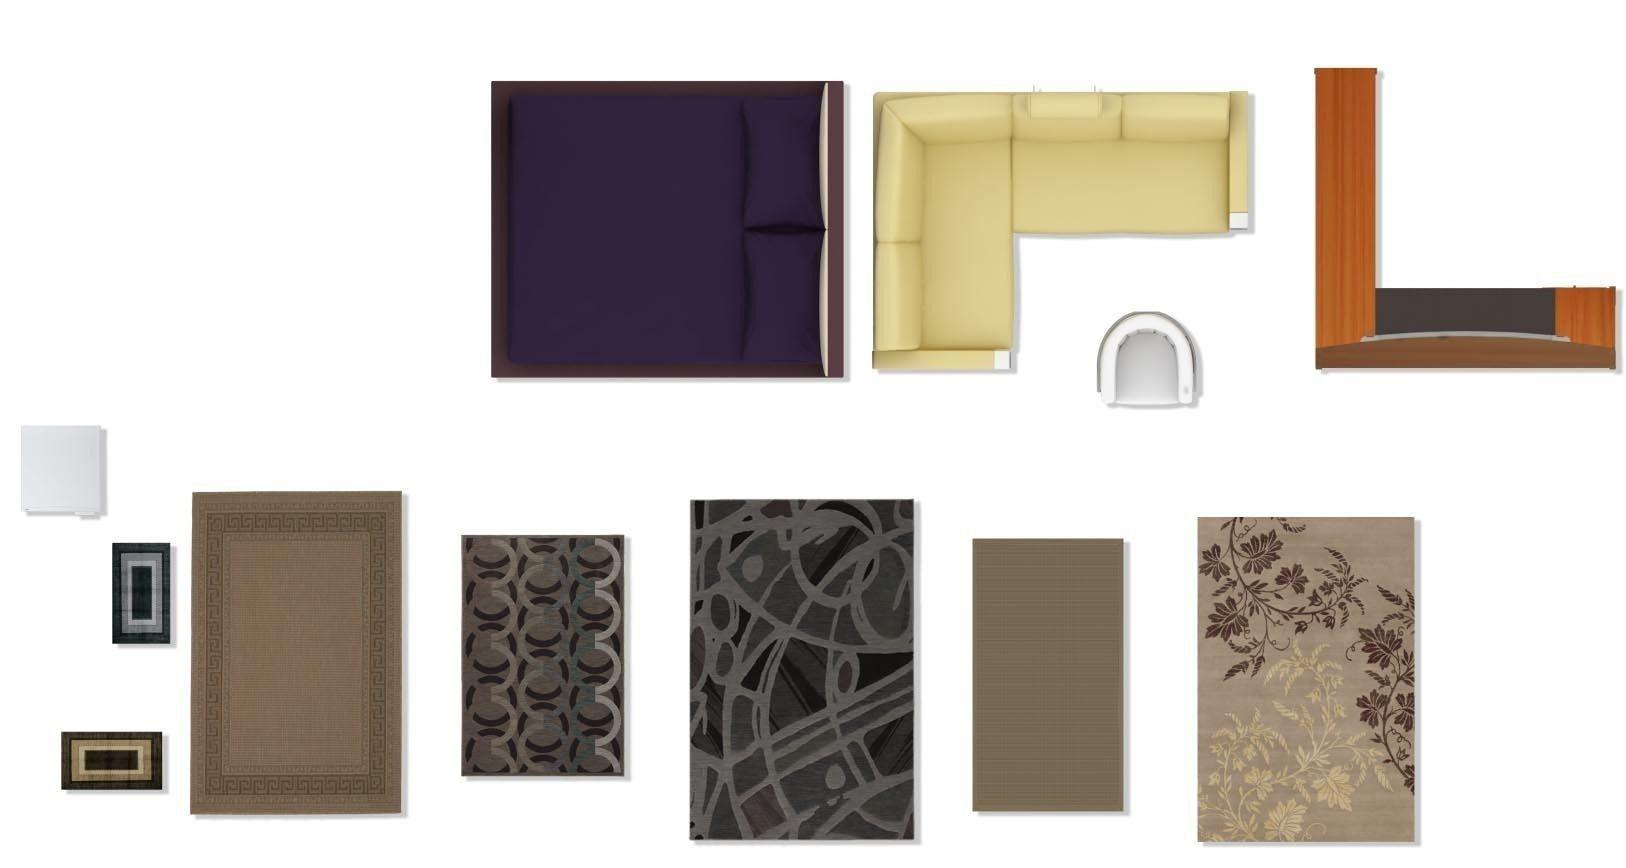 psd 2d floorplan furniture 3d model cgtrader psd 2d floorplan furniture 3d model